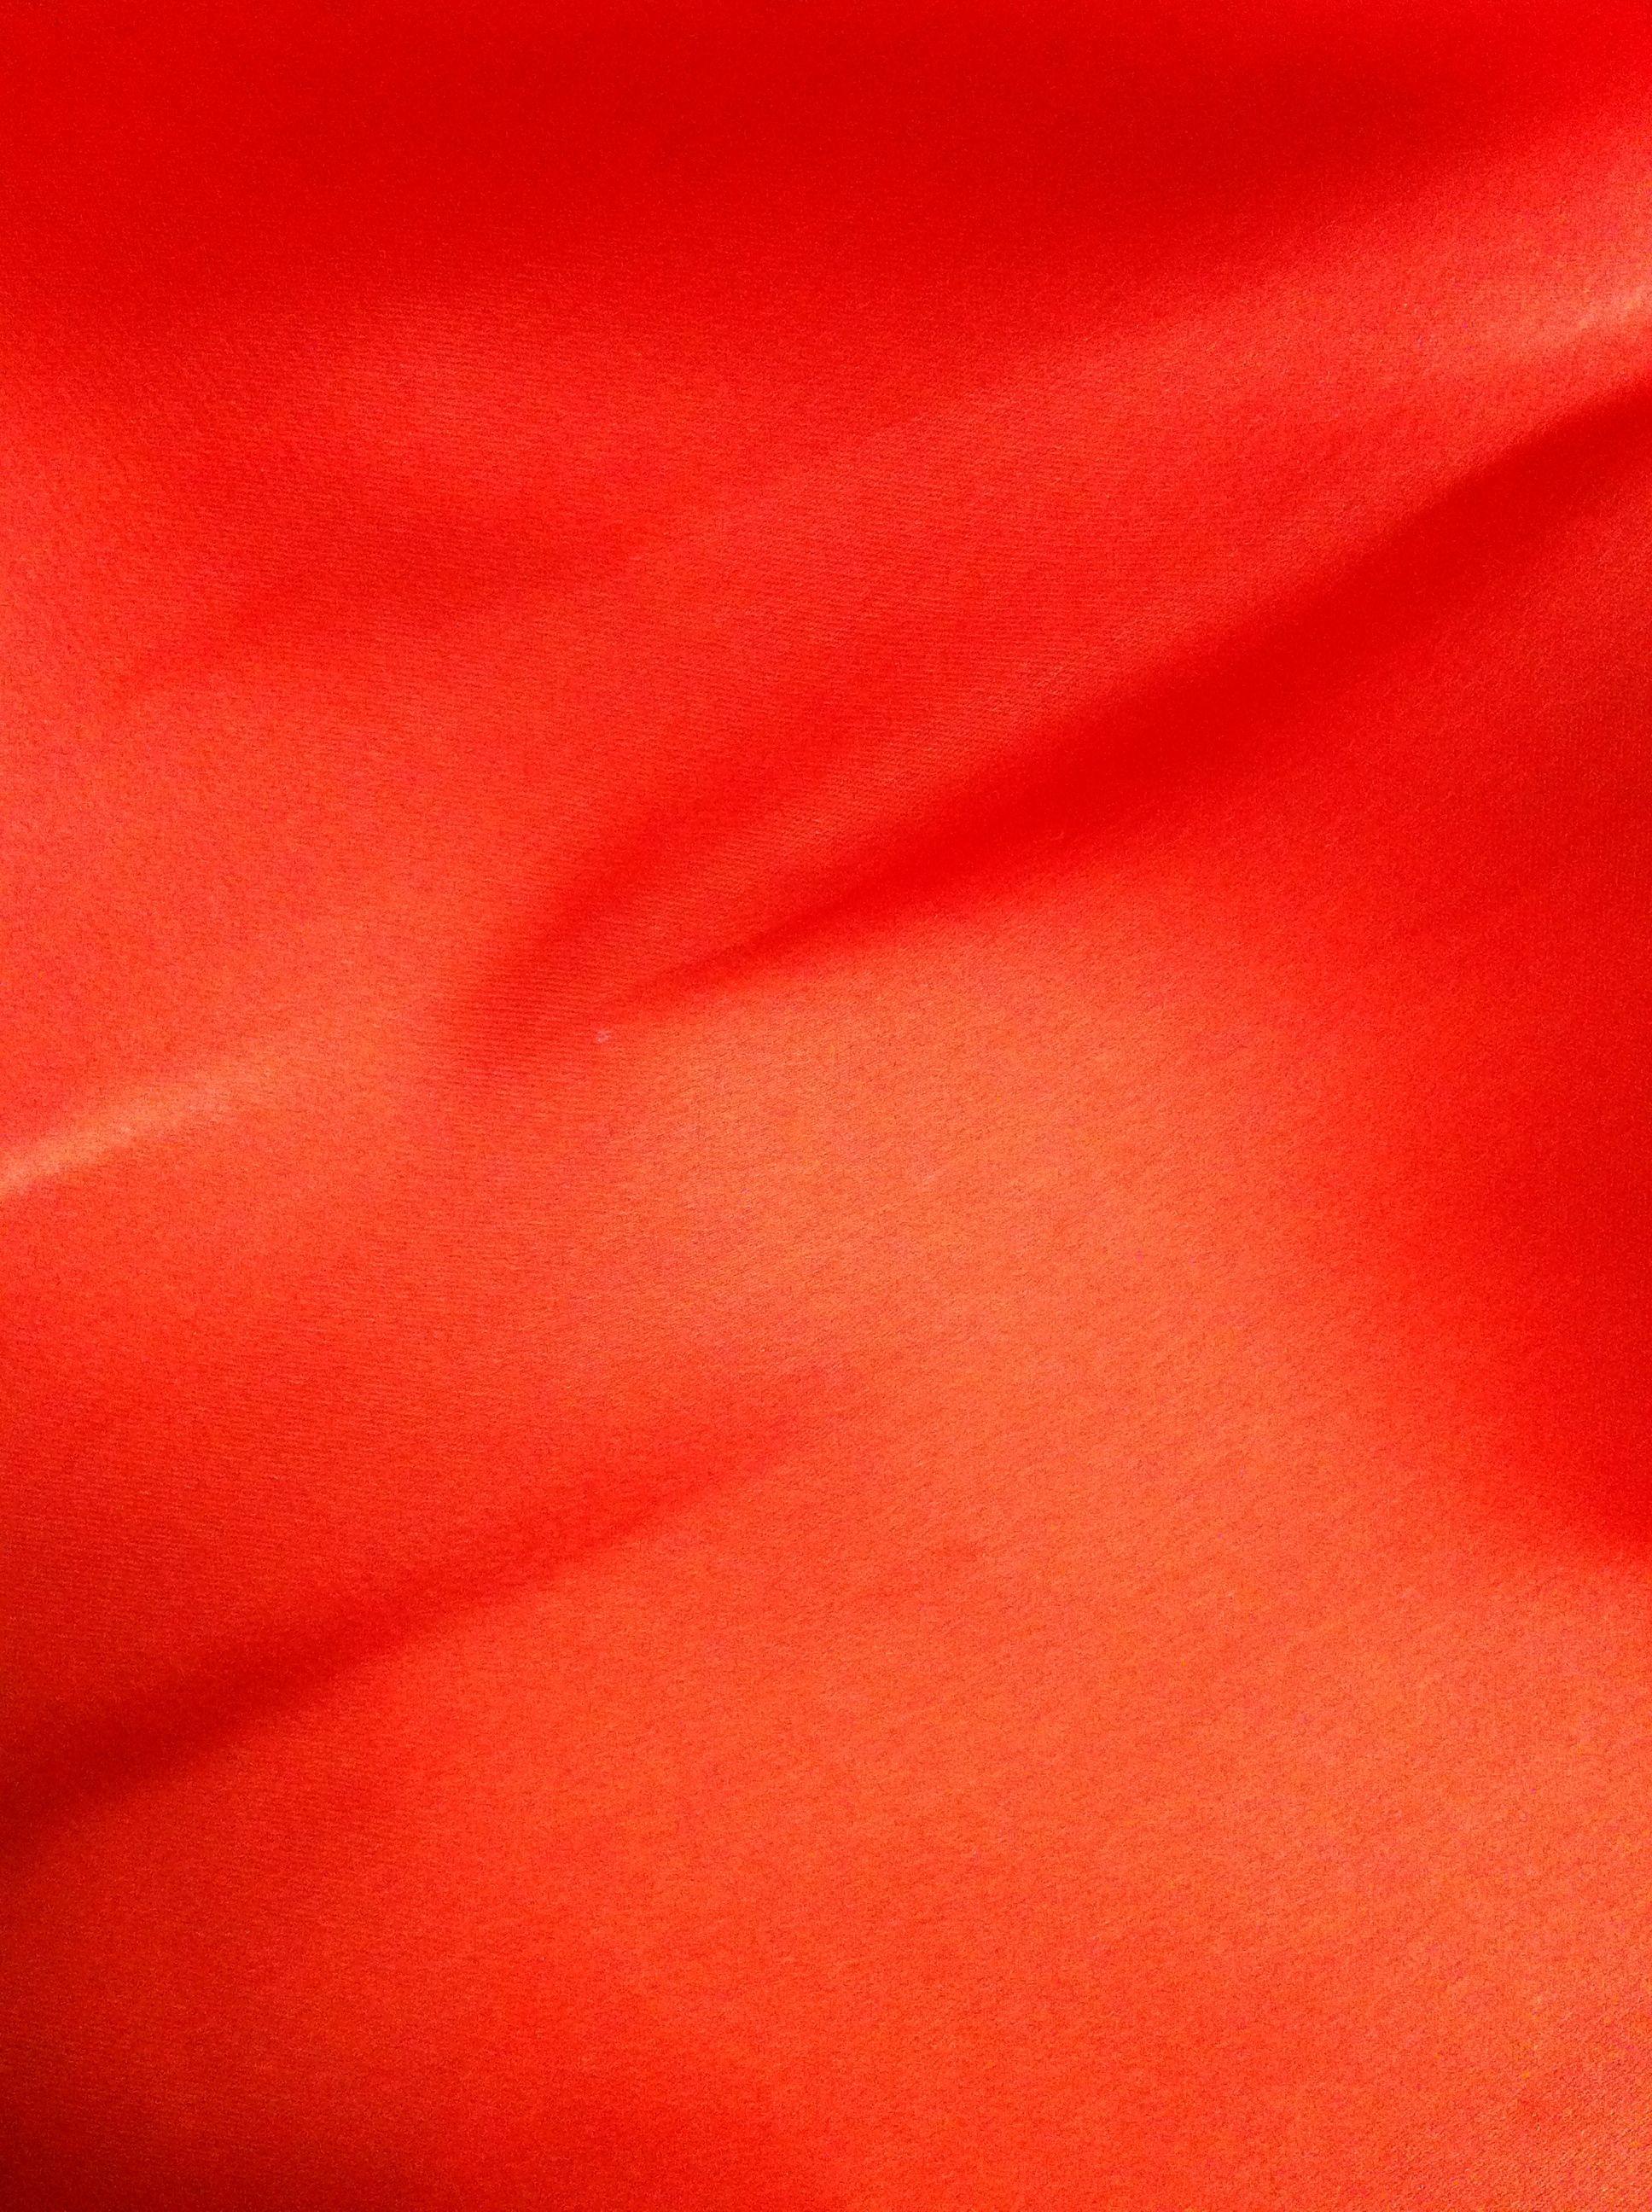 Blood Orange Red Paint Accent Onekingslane Designisneverdone